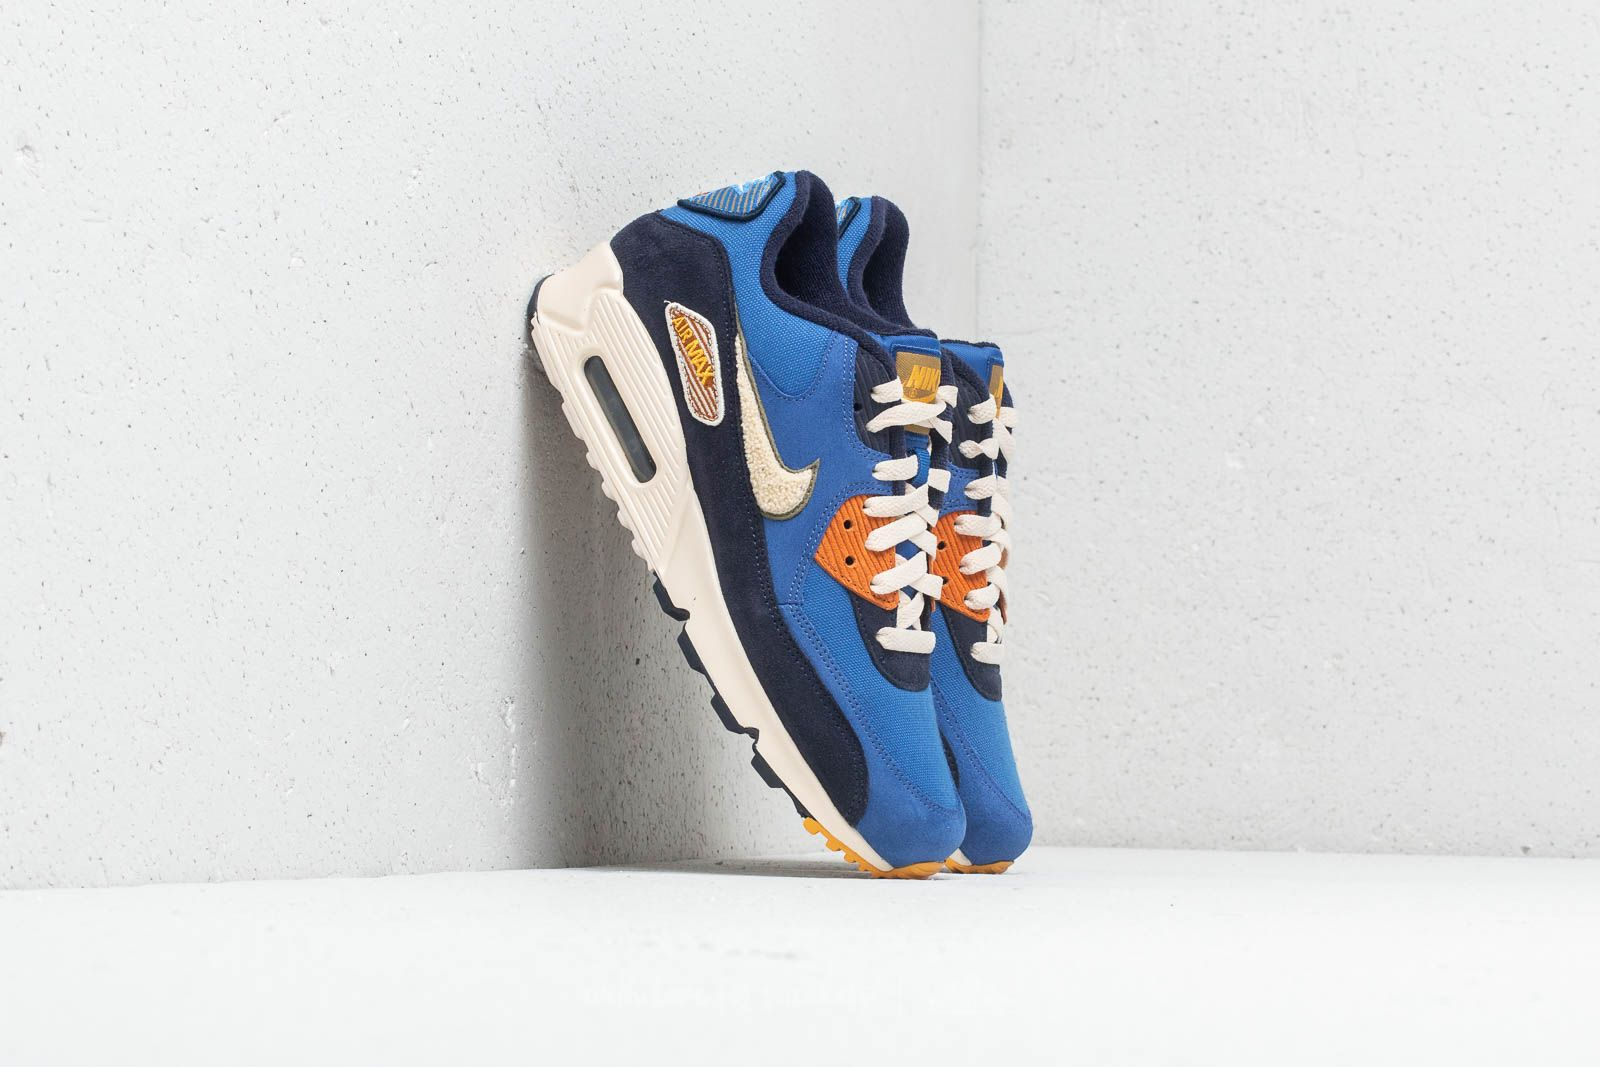 Men's shoes Nike Air Max 90 Premium SE